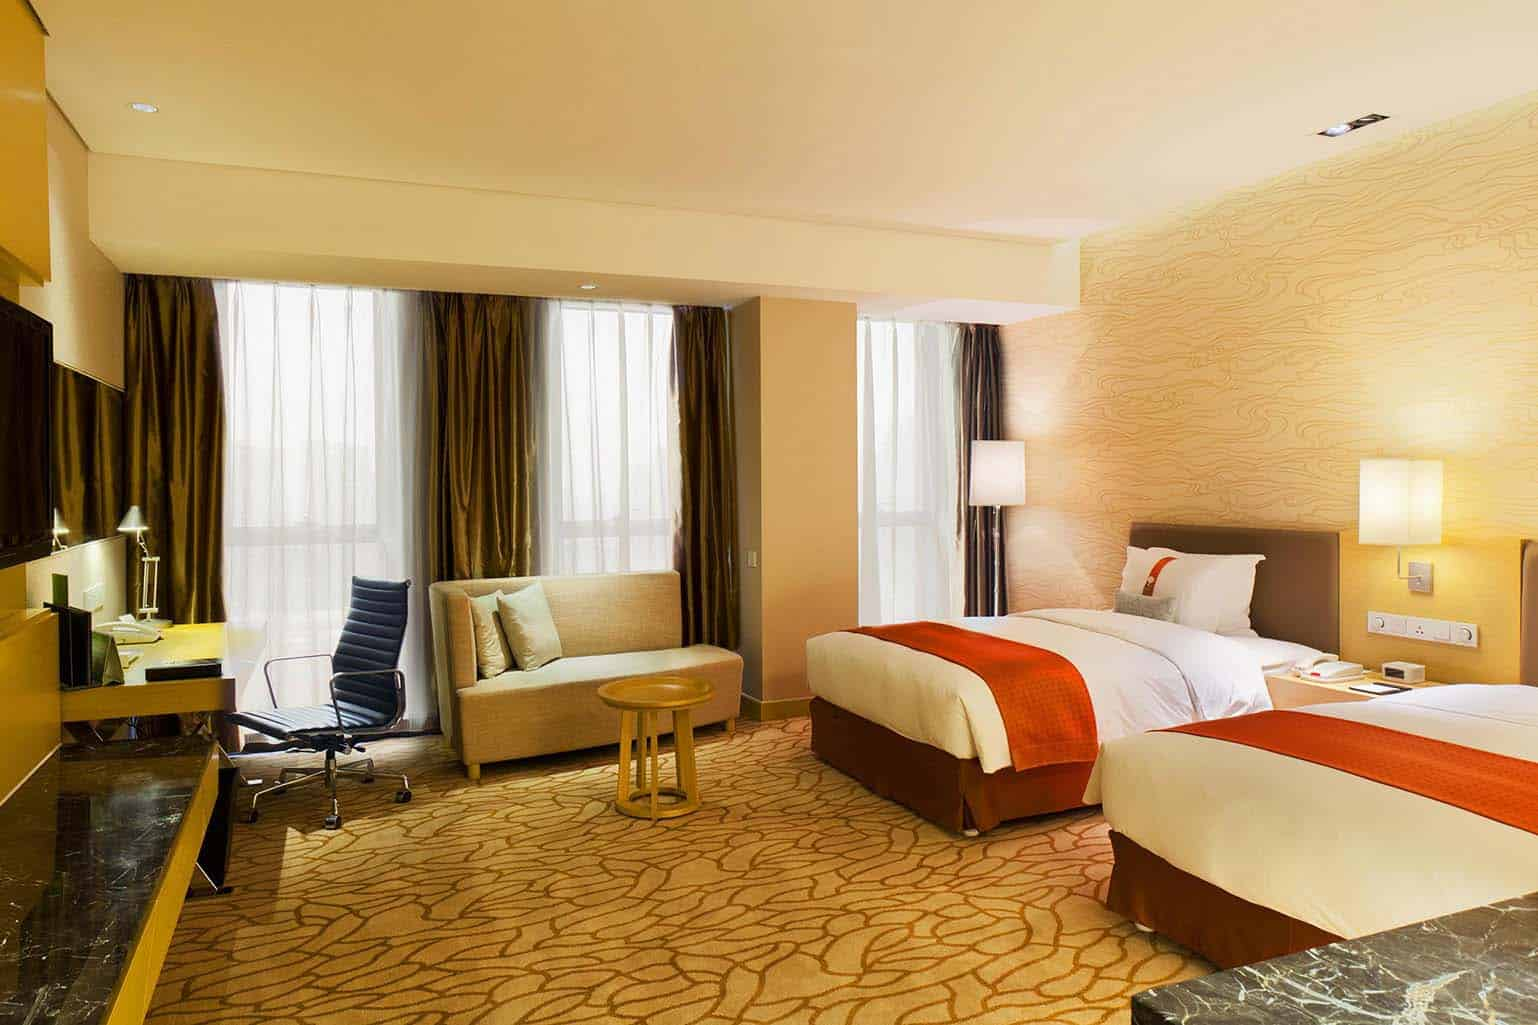 Holiday Inn Tianjin Aqua Centre